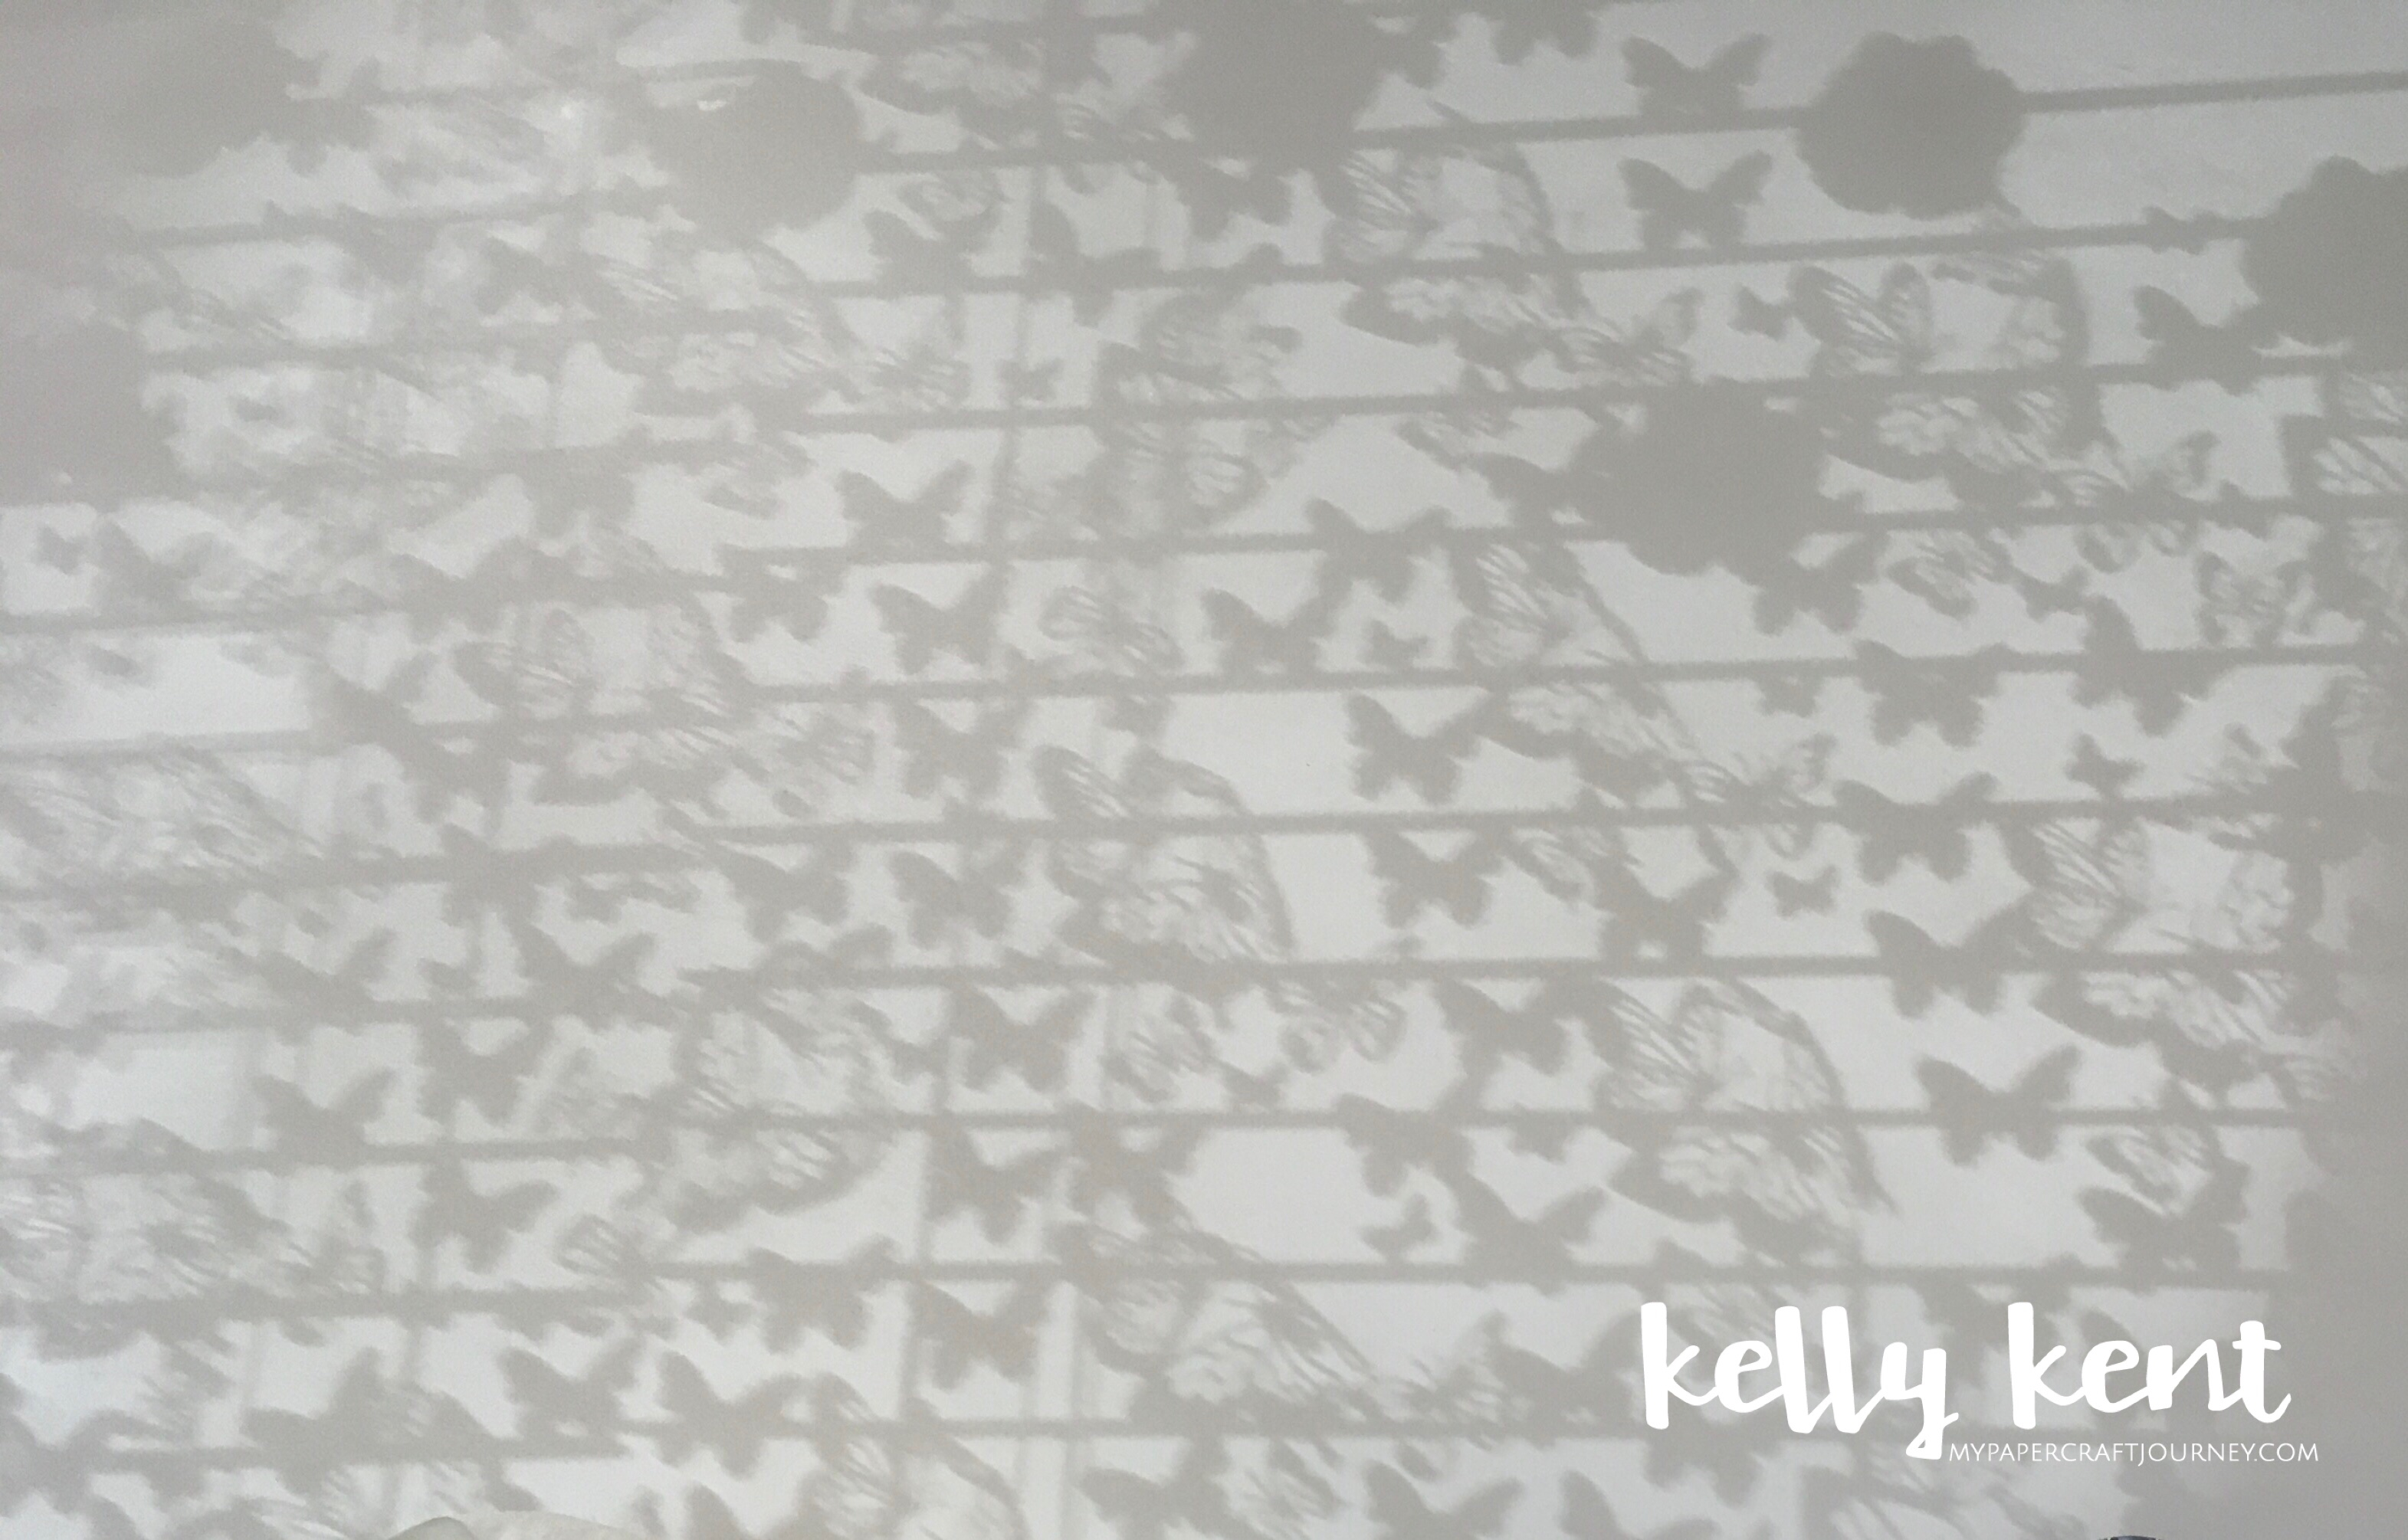 Rainbow Window | kelly kent